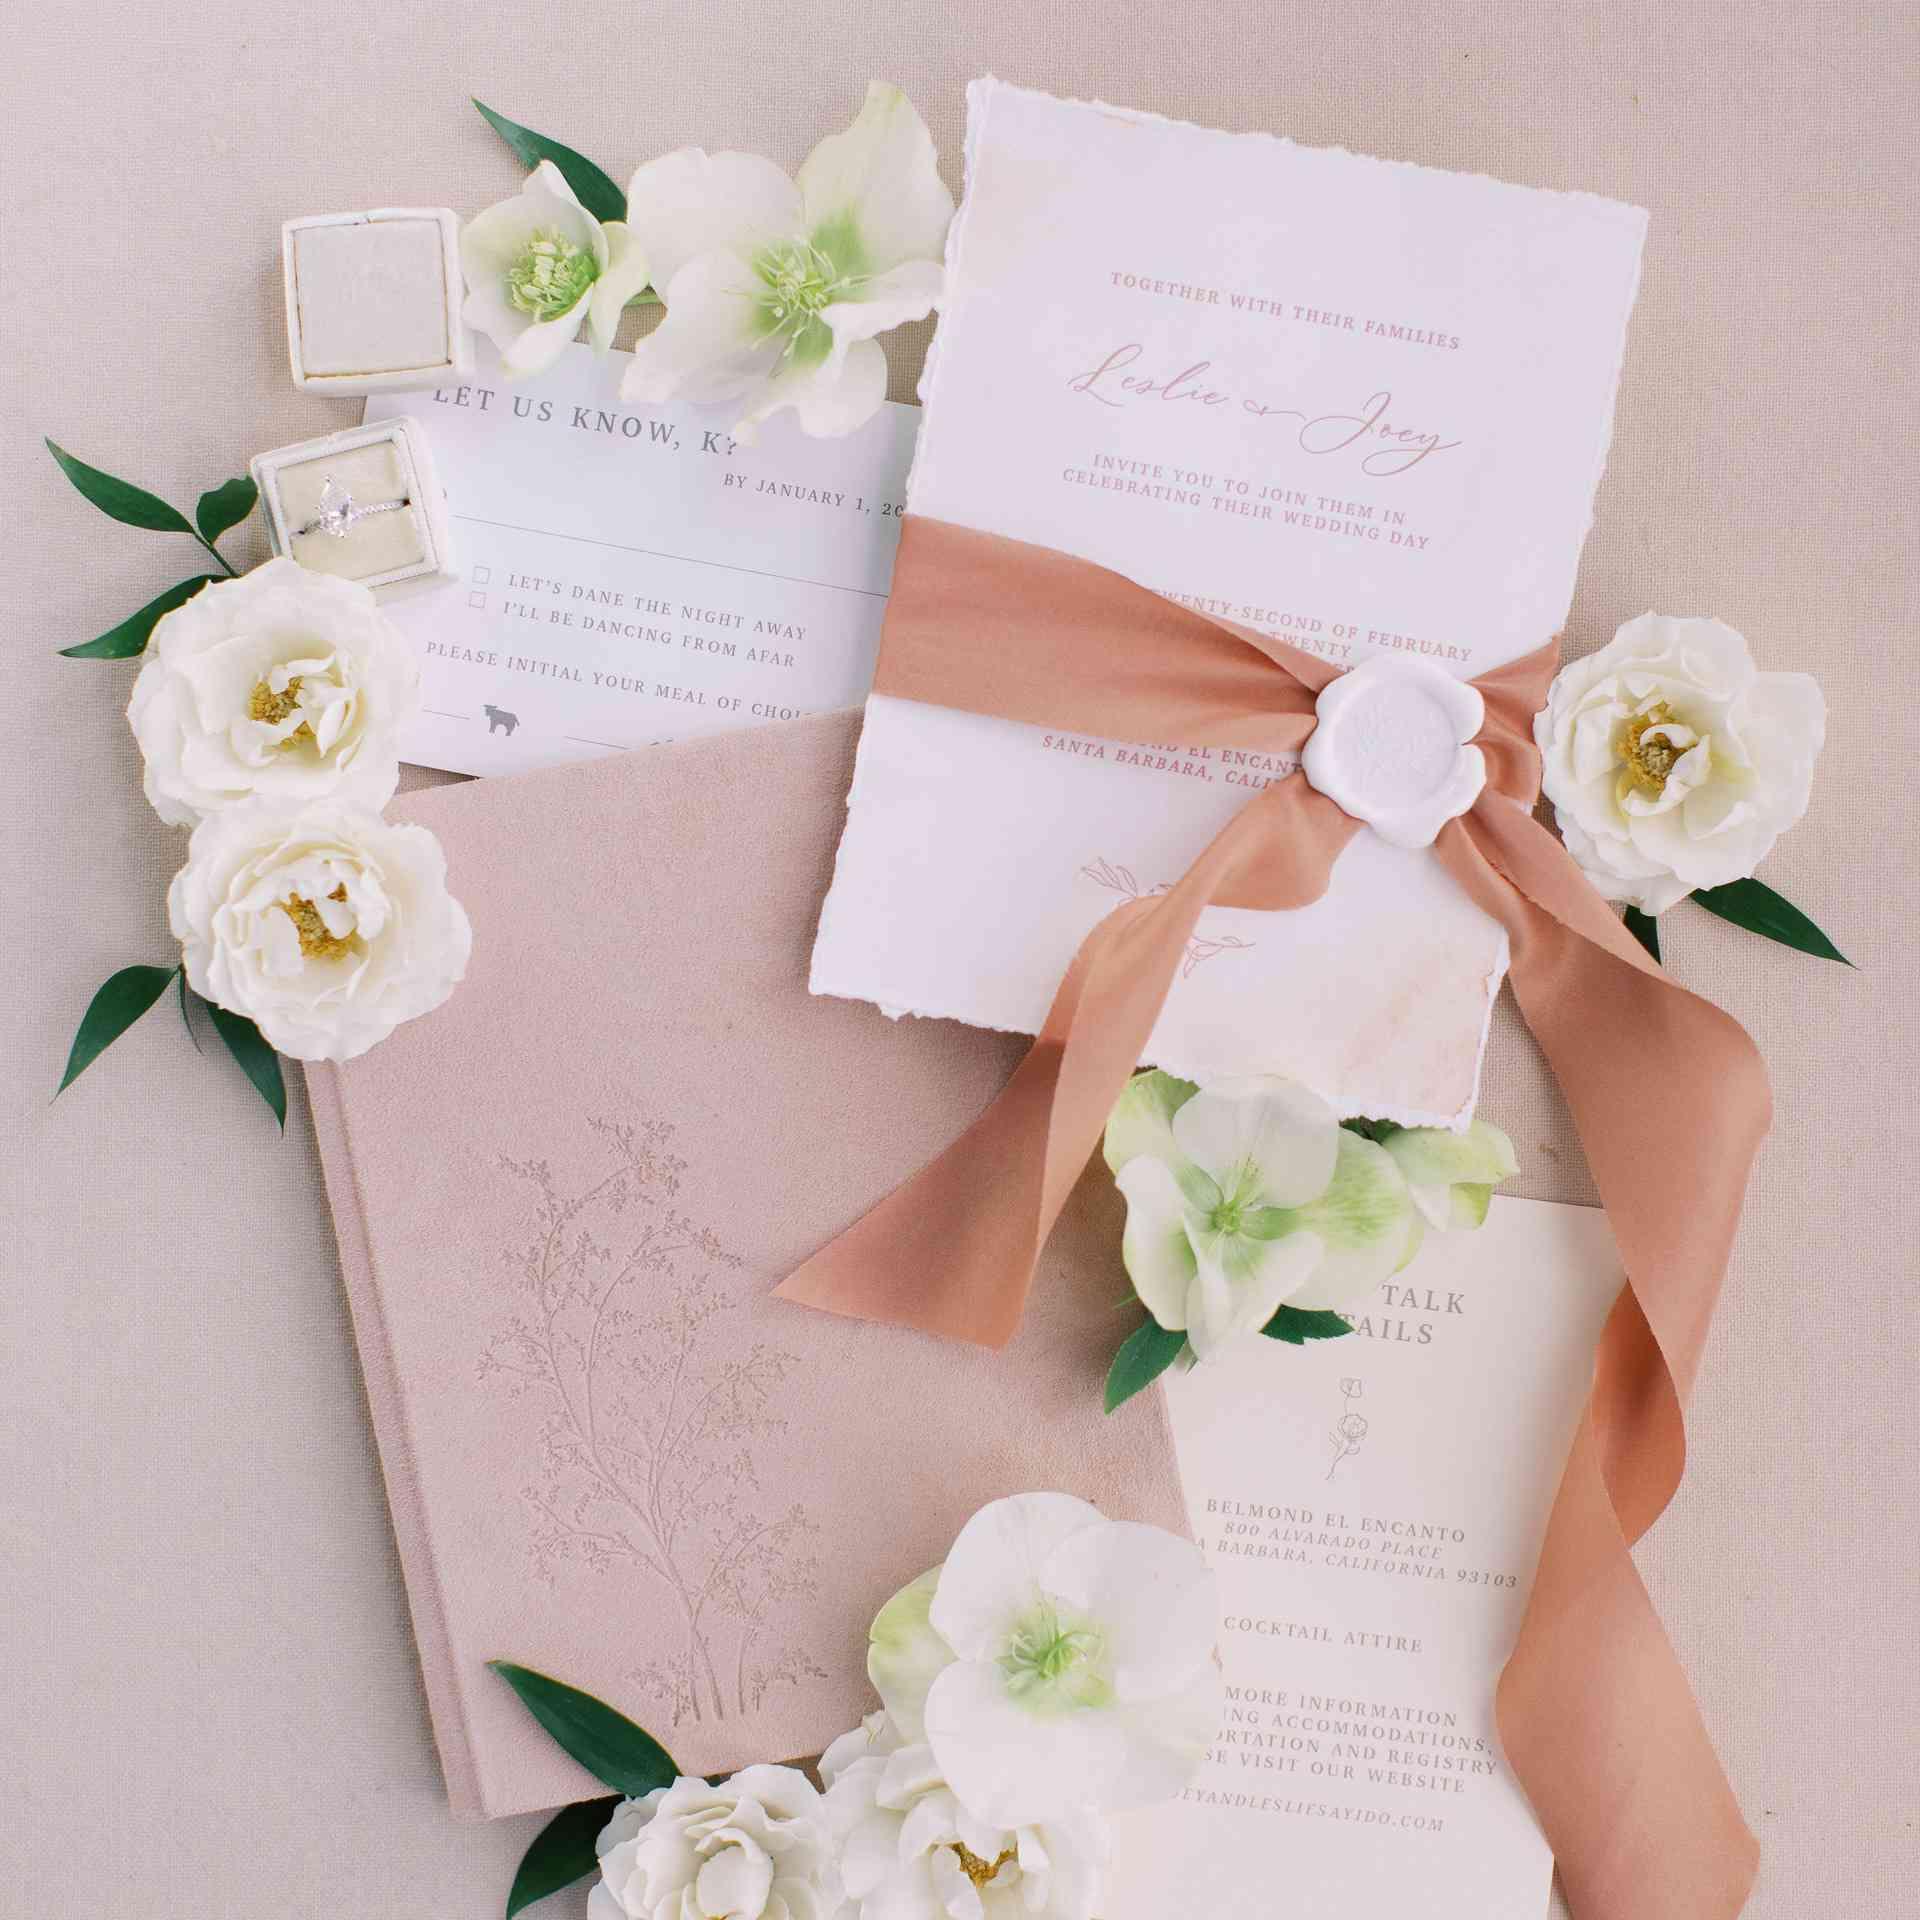 30 invitation ideas for any wedding style